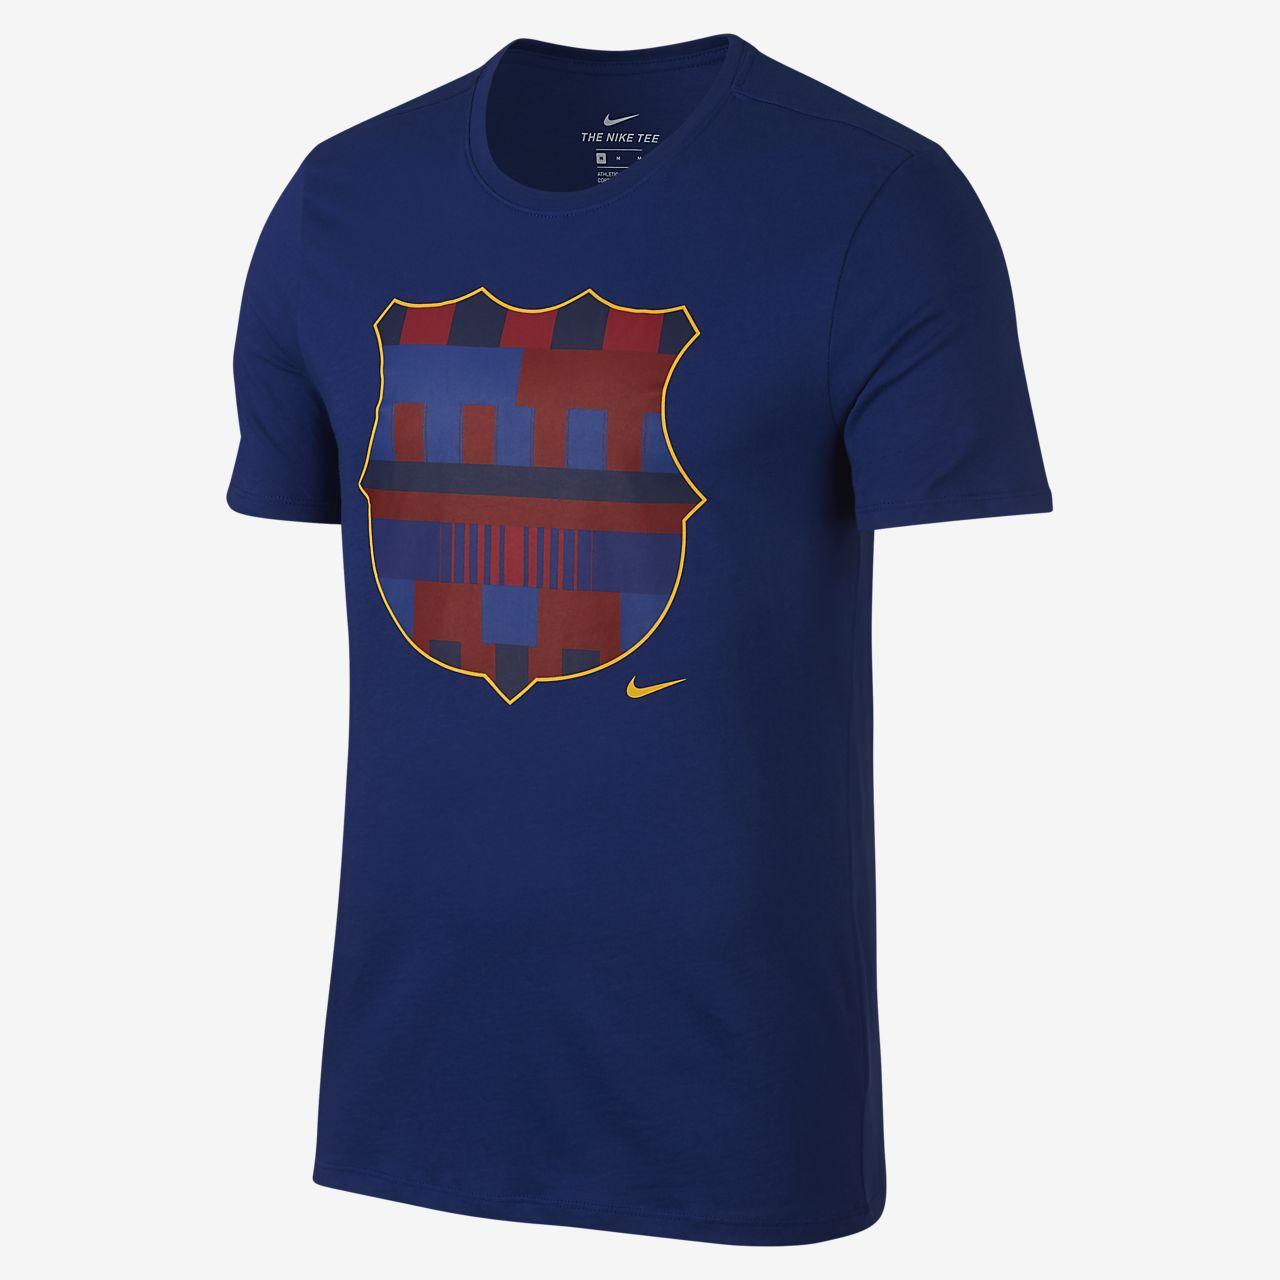 cc97647f1496 Fc Barcelona Nike Tee T Shirt - Querciacb